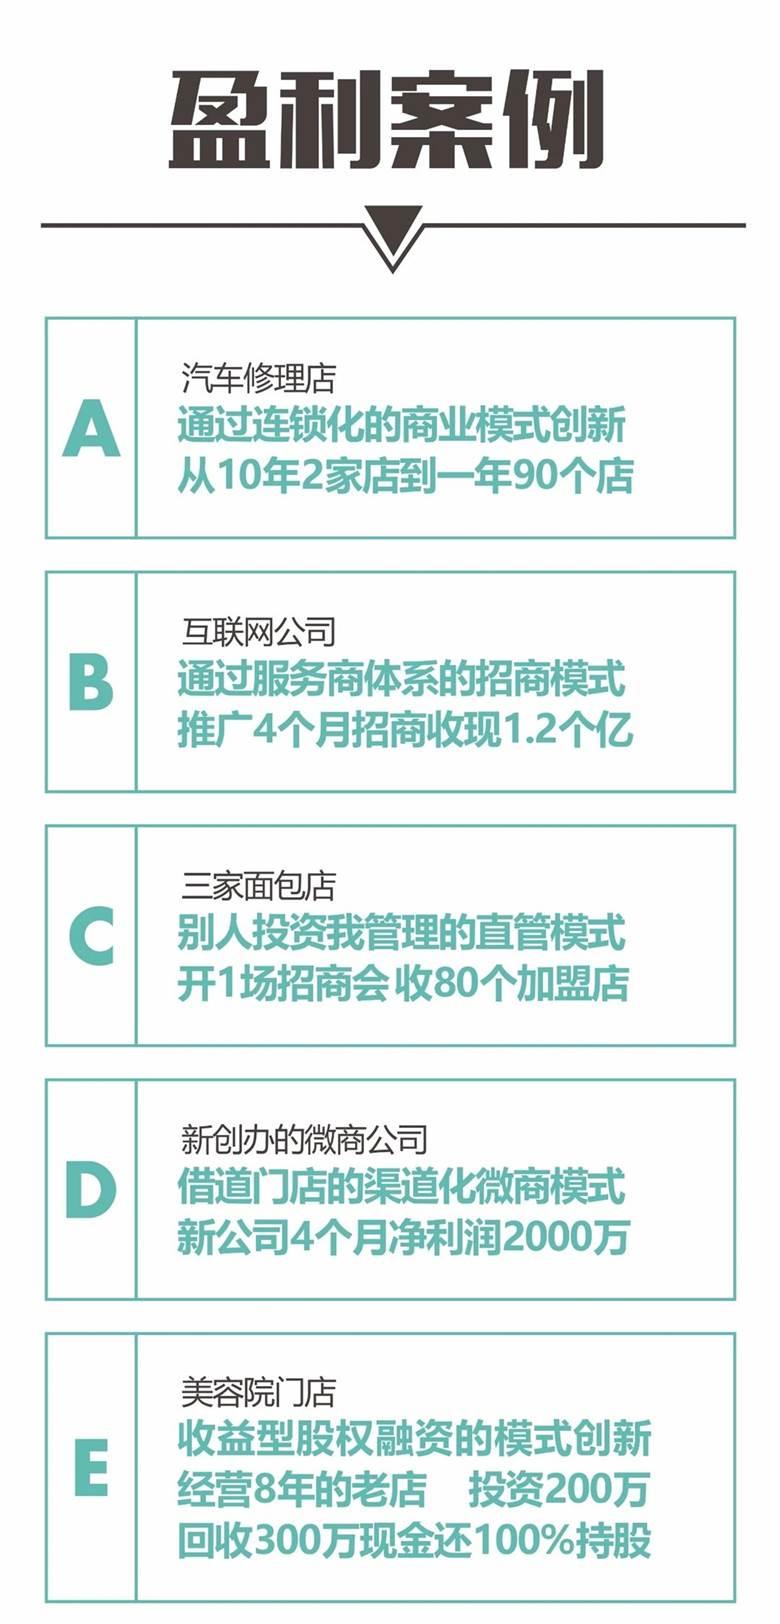 http://www.huodongxing.com/file/20191113/1063603644976/613659459633203.jpg